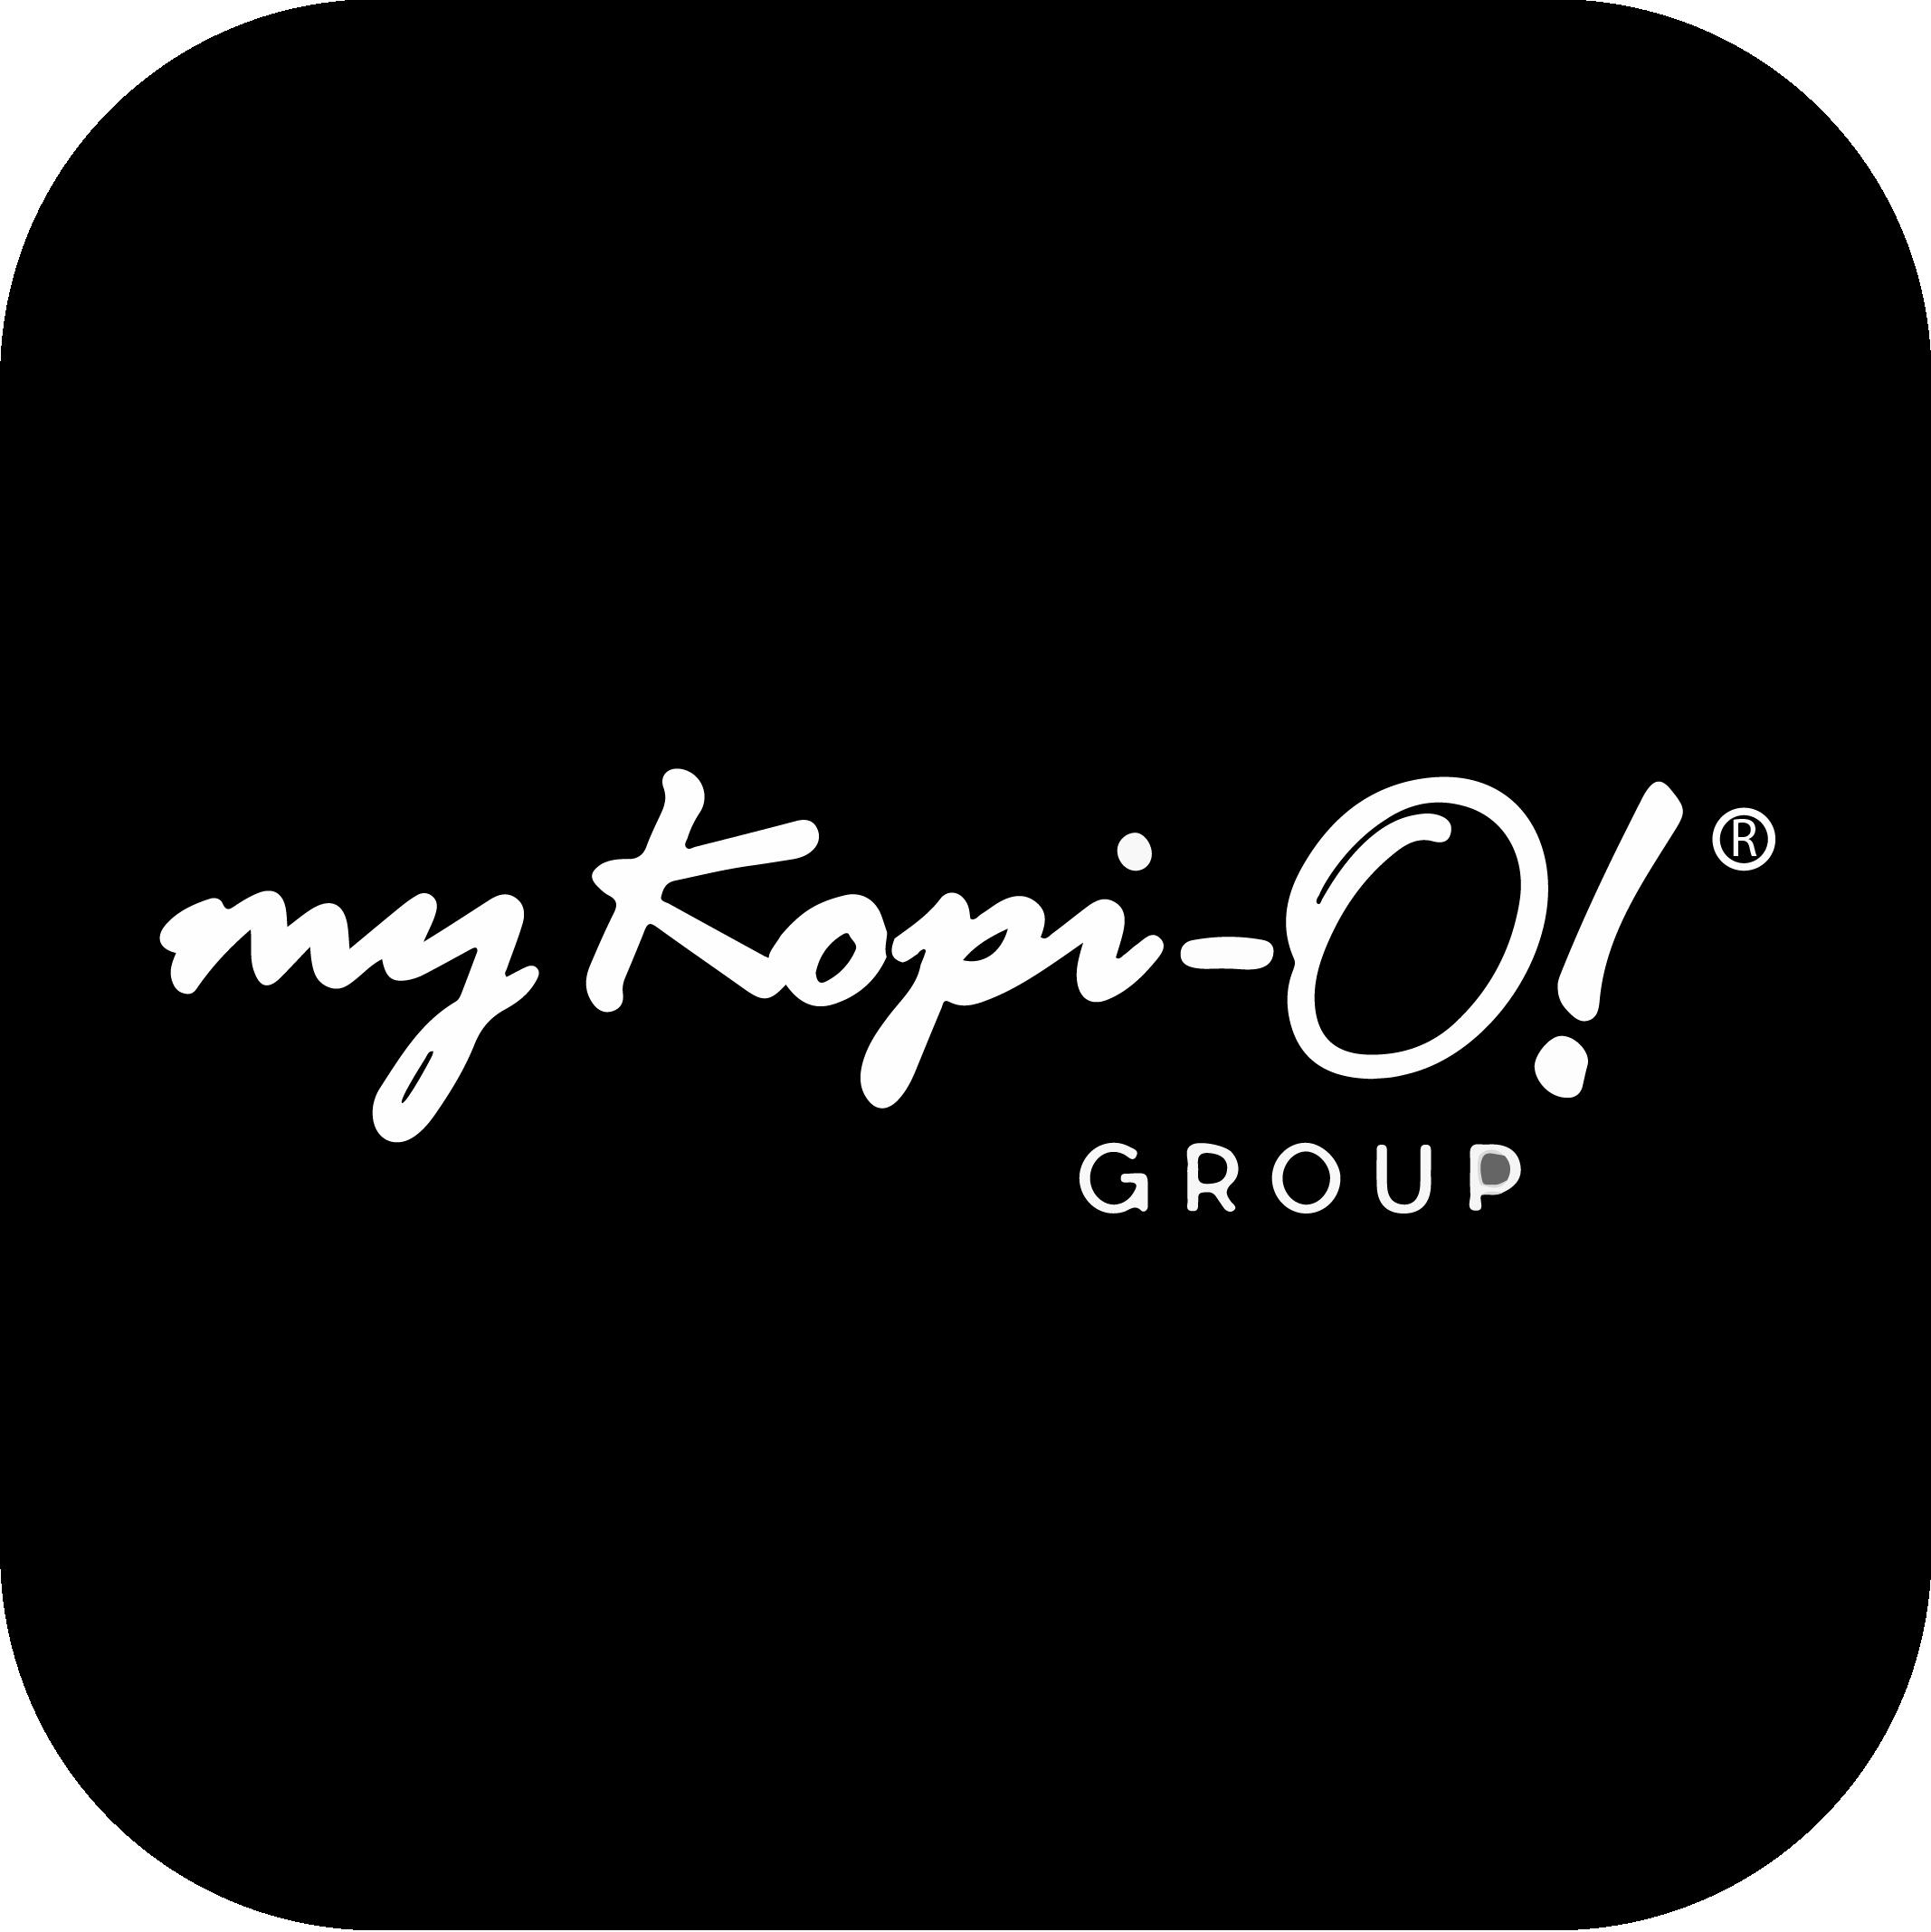 MY KOPI O! GROUP